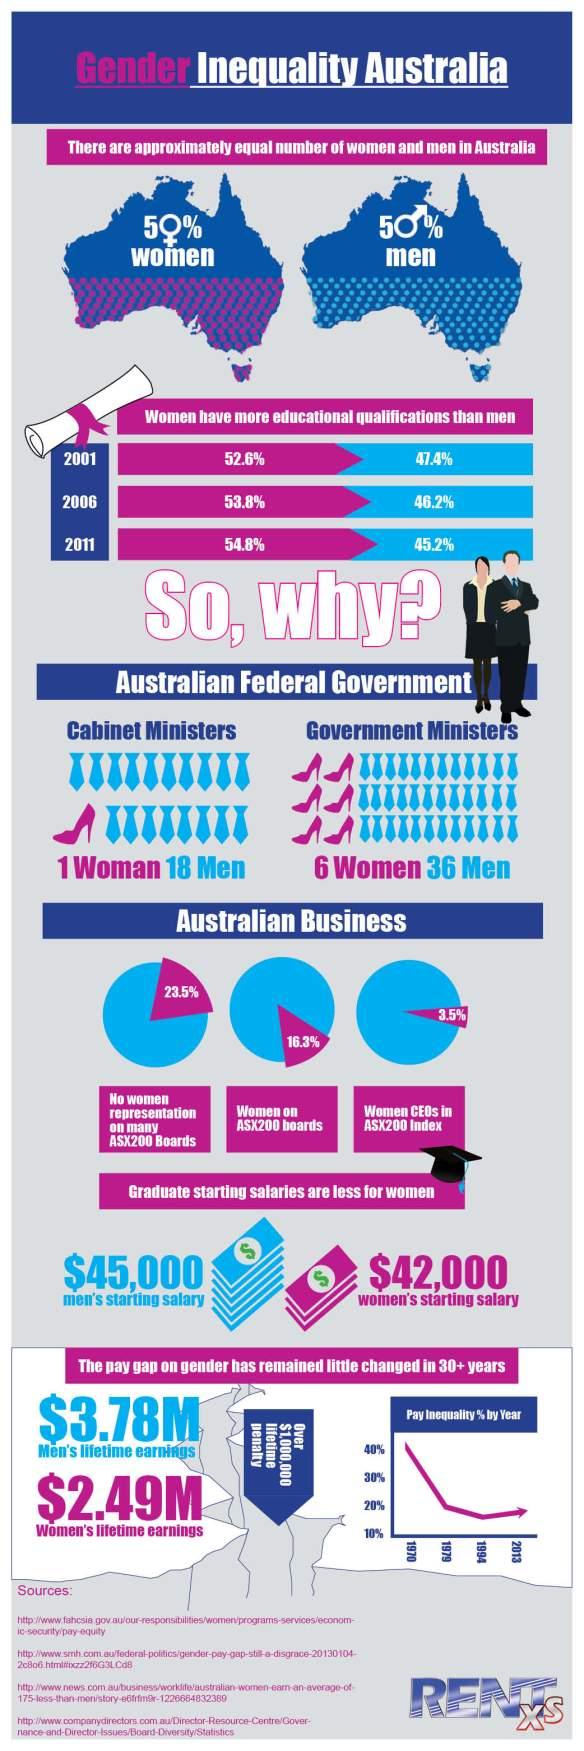 Gender Inequality Australia 2013